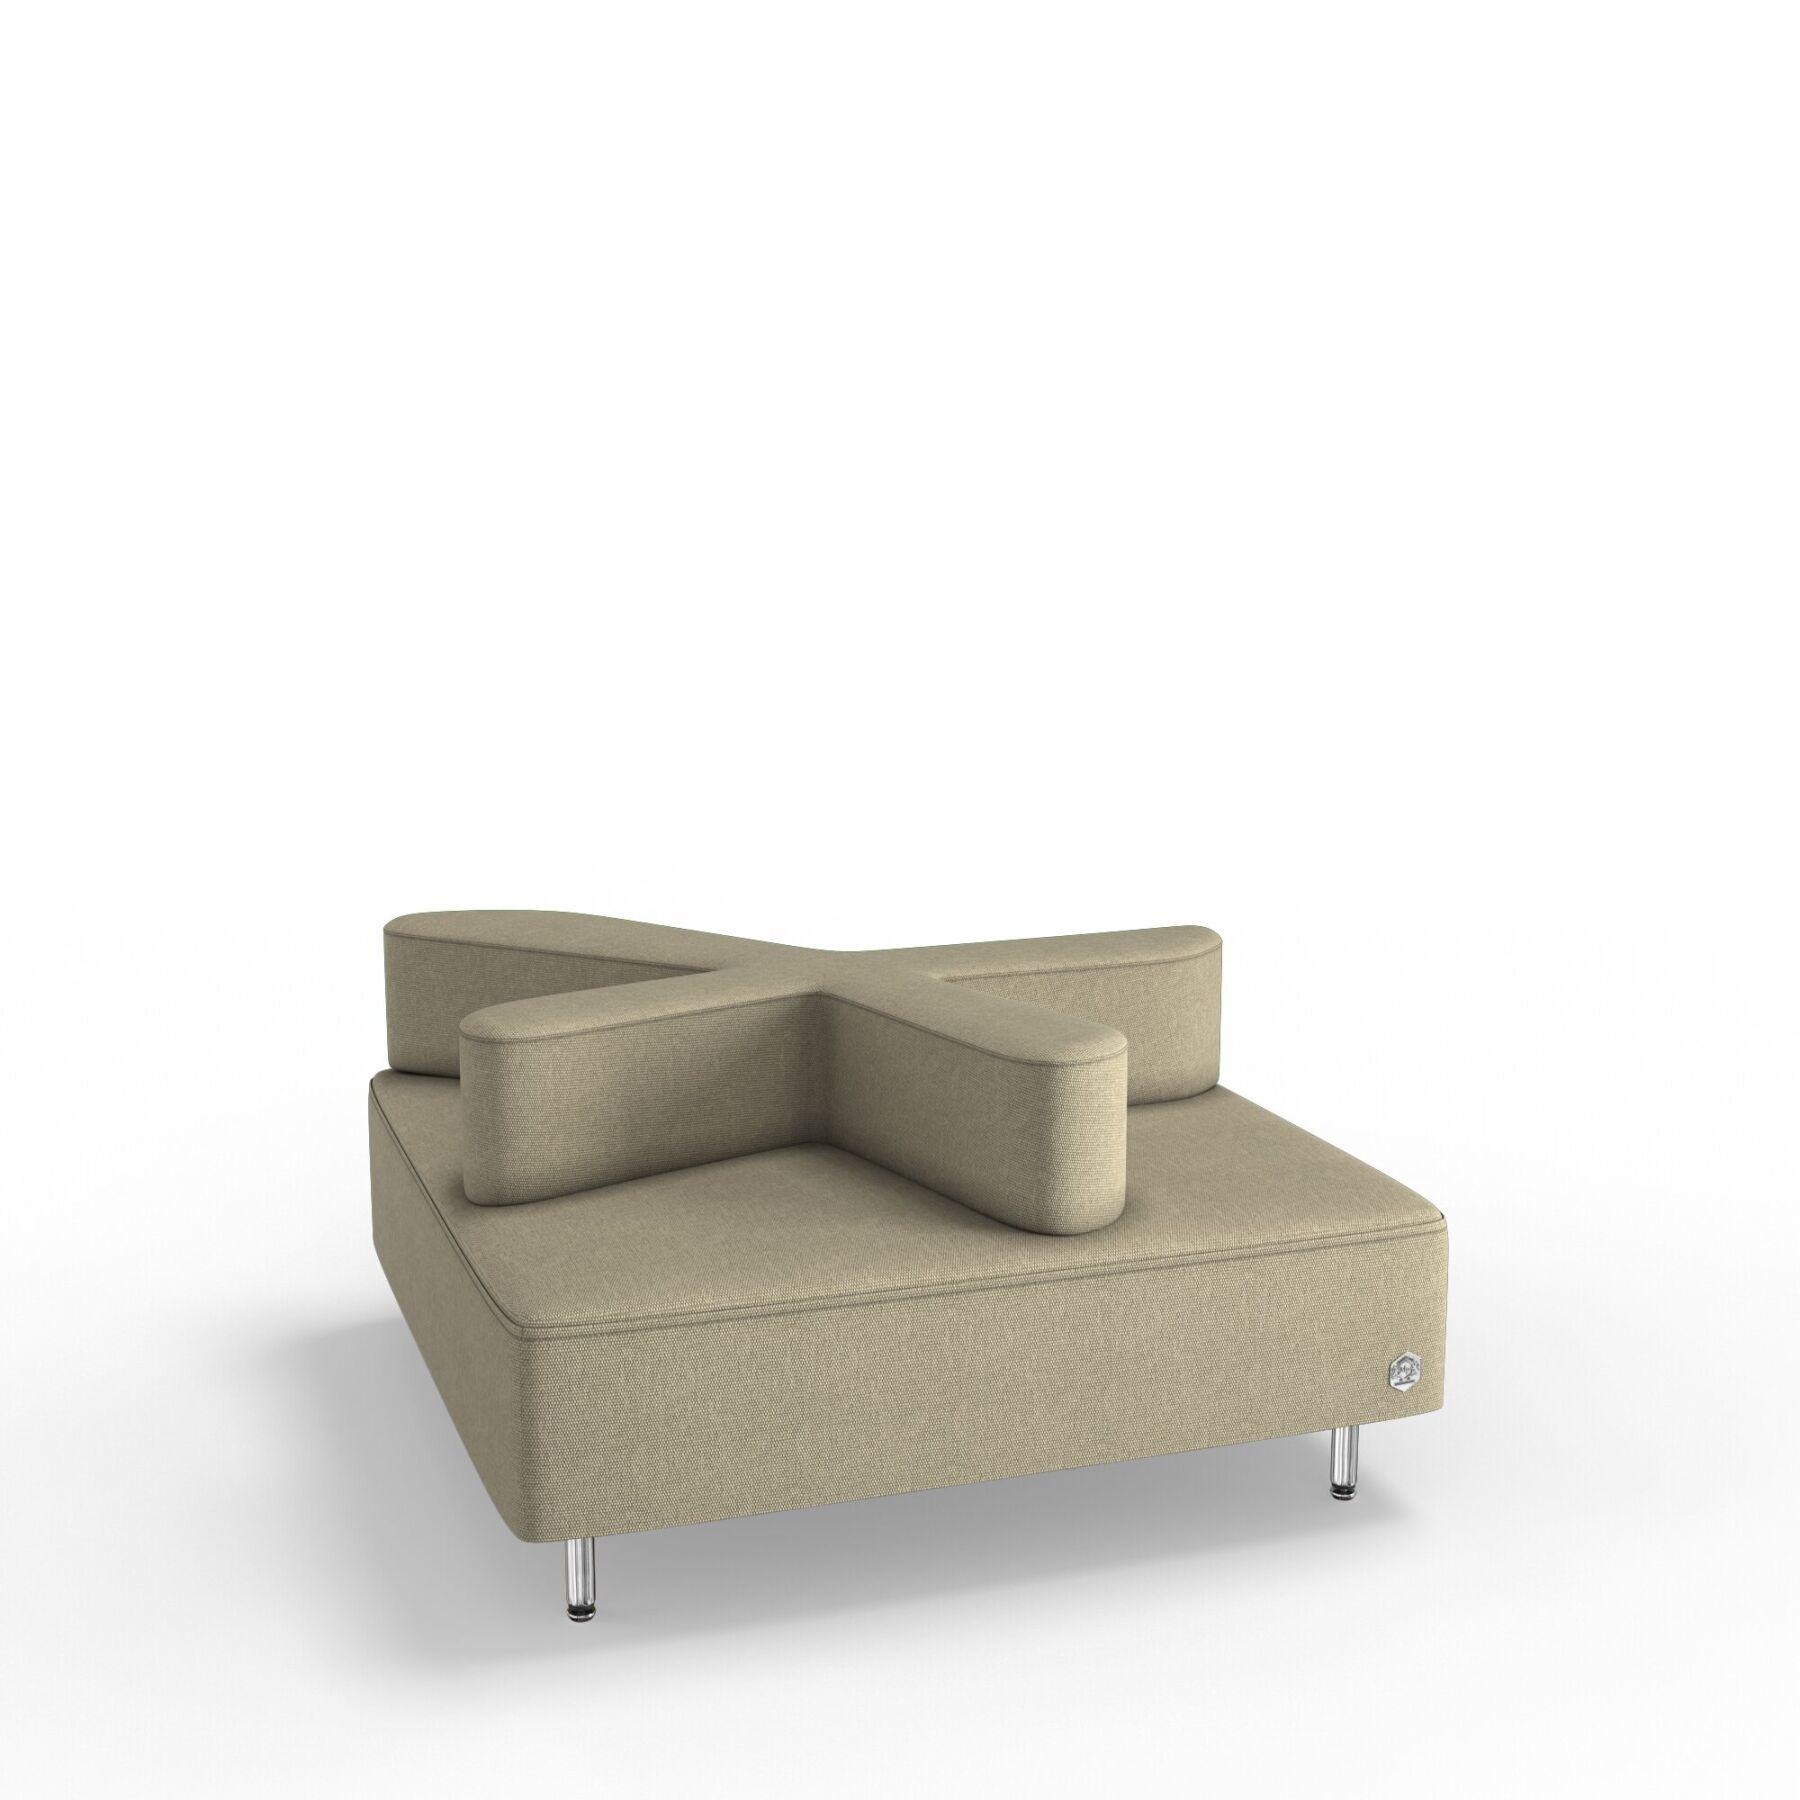 Четырехместный диван KULIK SYSTEM STAR Ткань Целый